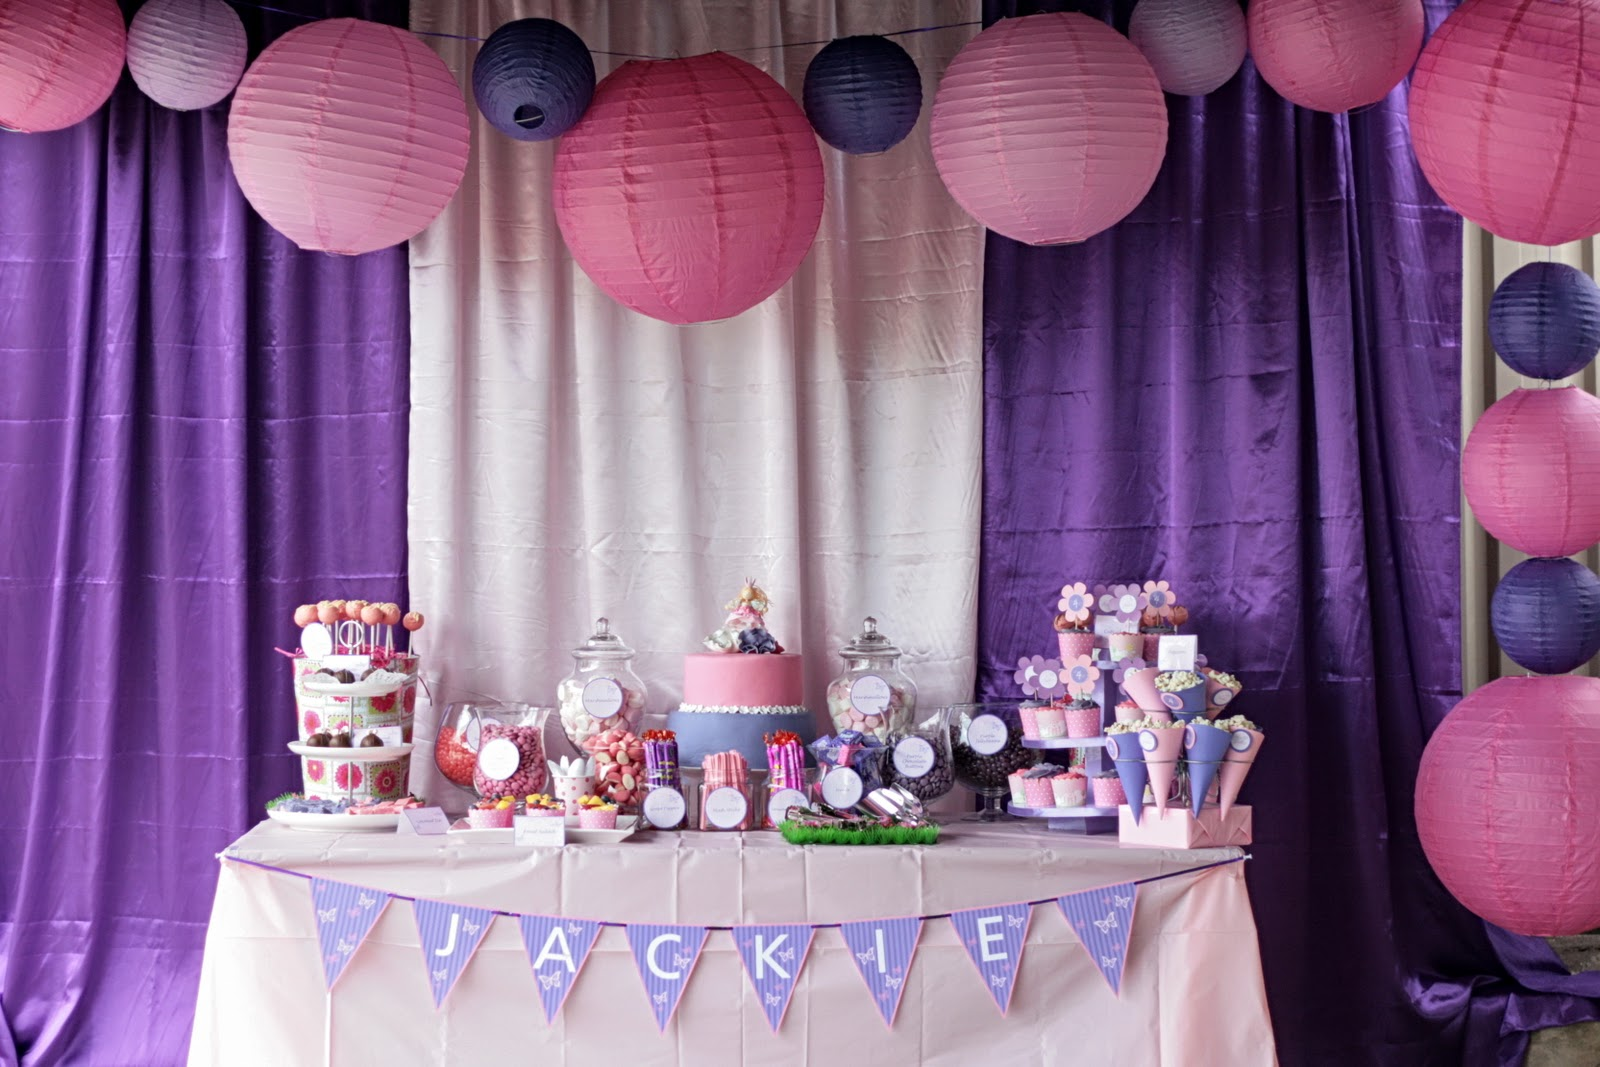 Kristys pink and purple dessert table